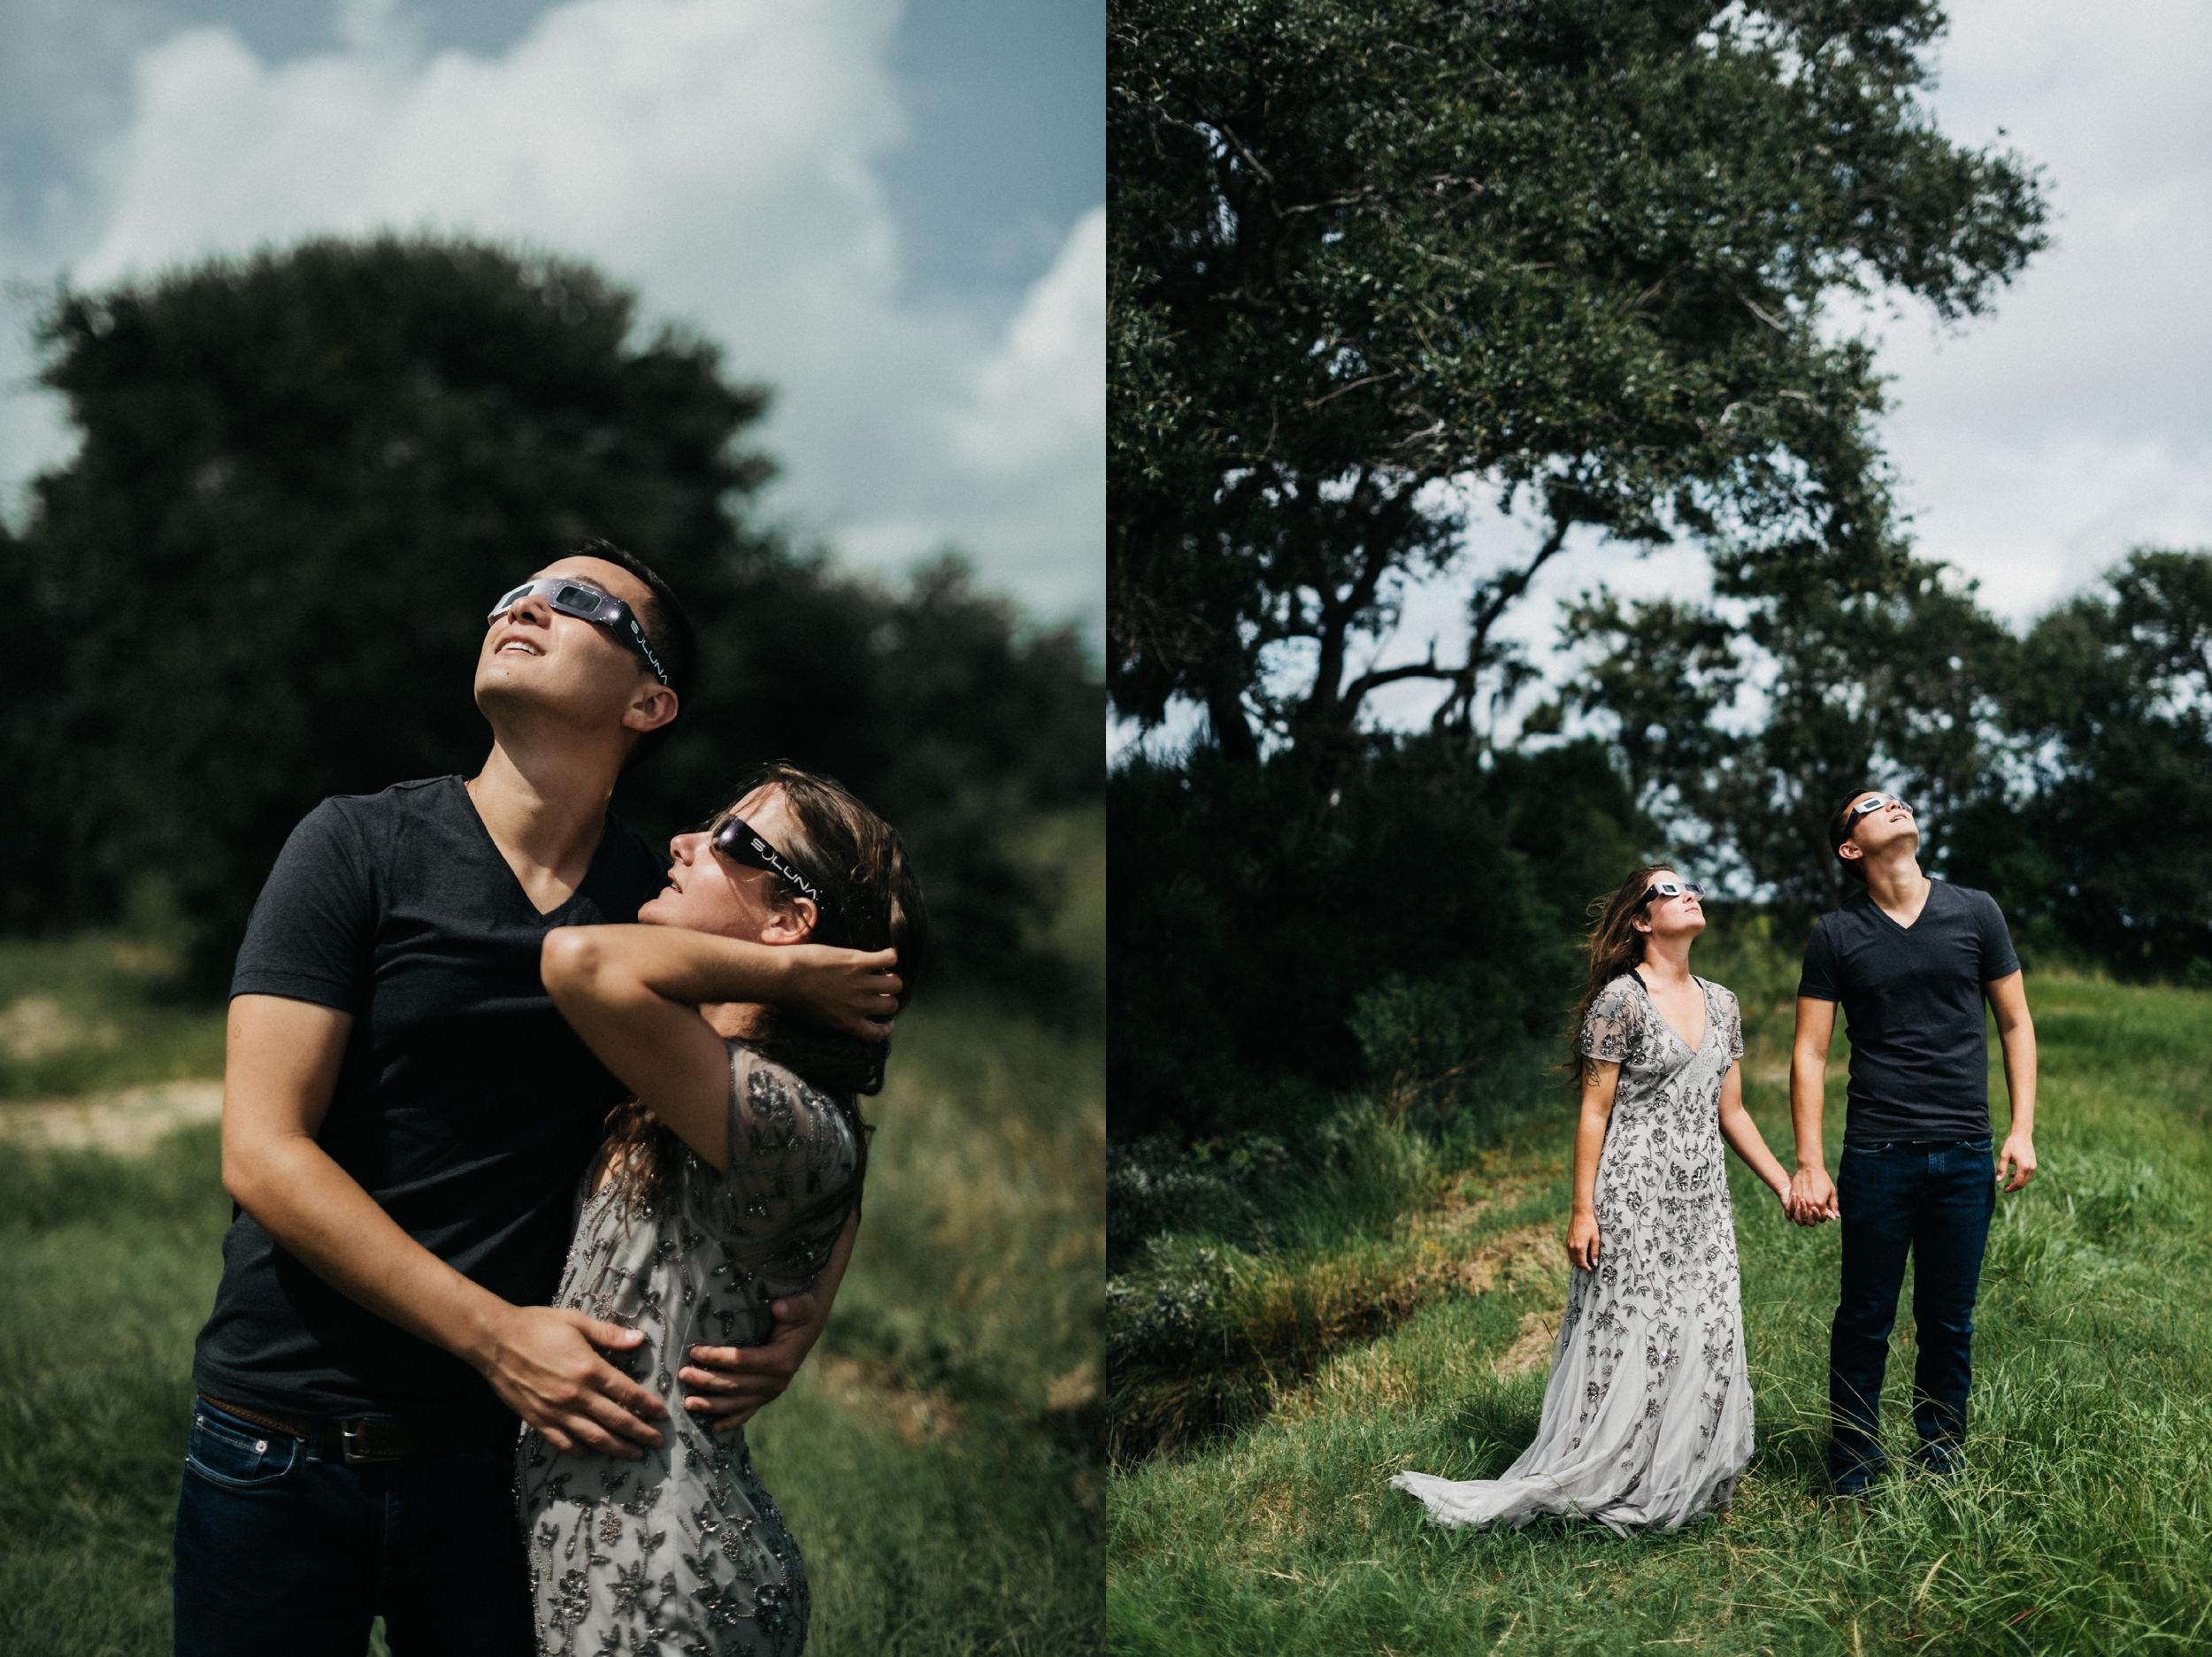 desiree-gardner-photography-pairs-france-monet-garden-monets-couple-wedding-engagement-giverny-30-a-30a-florida_0048.jpg